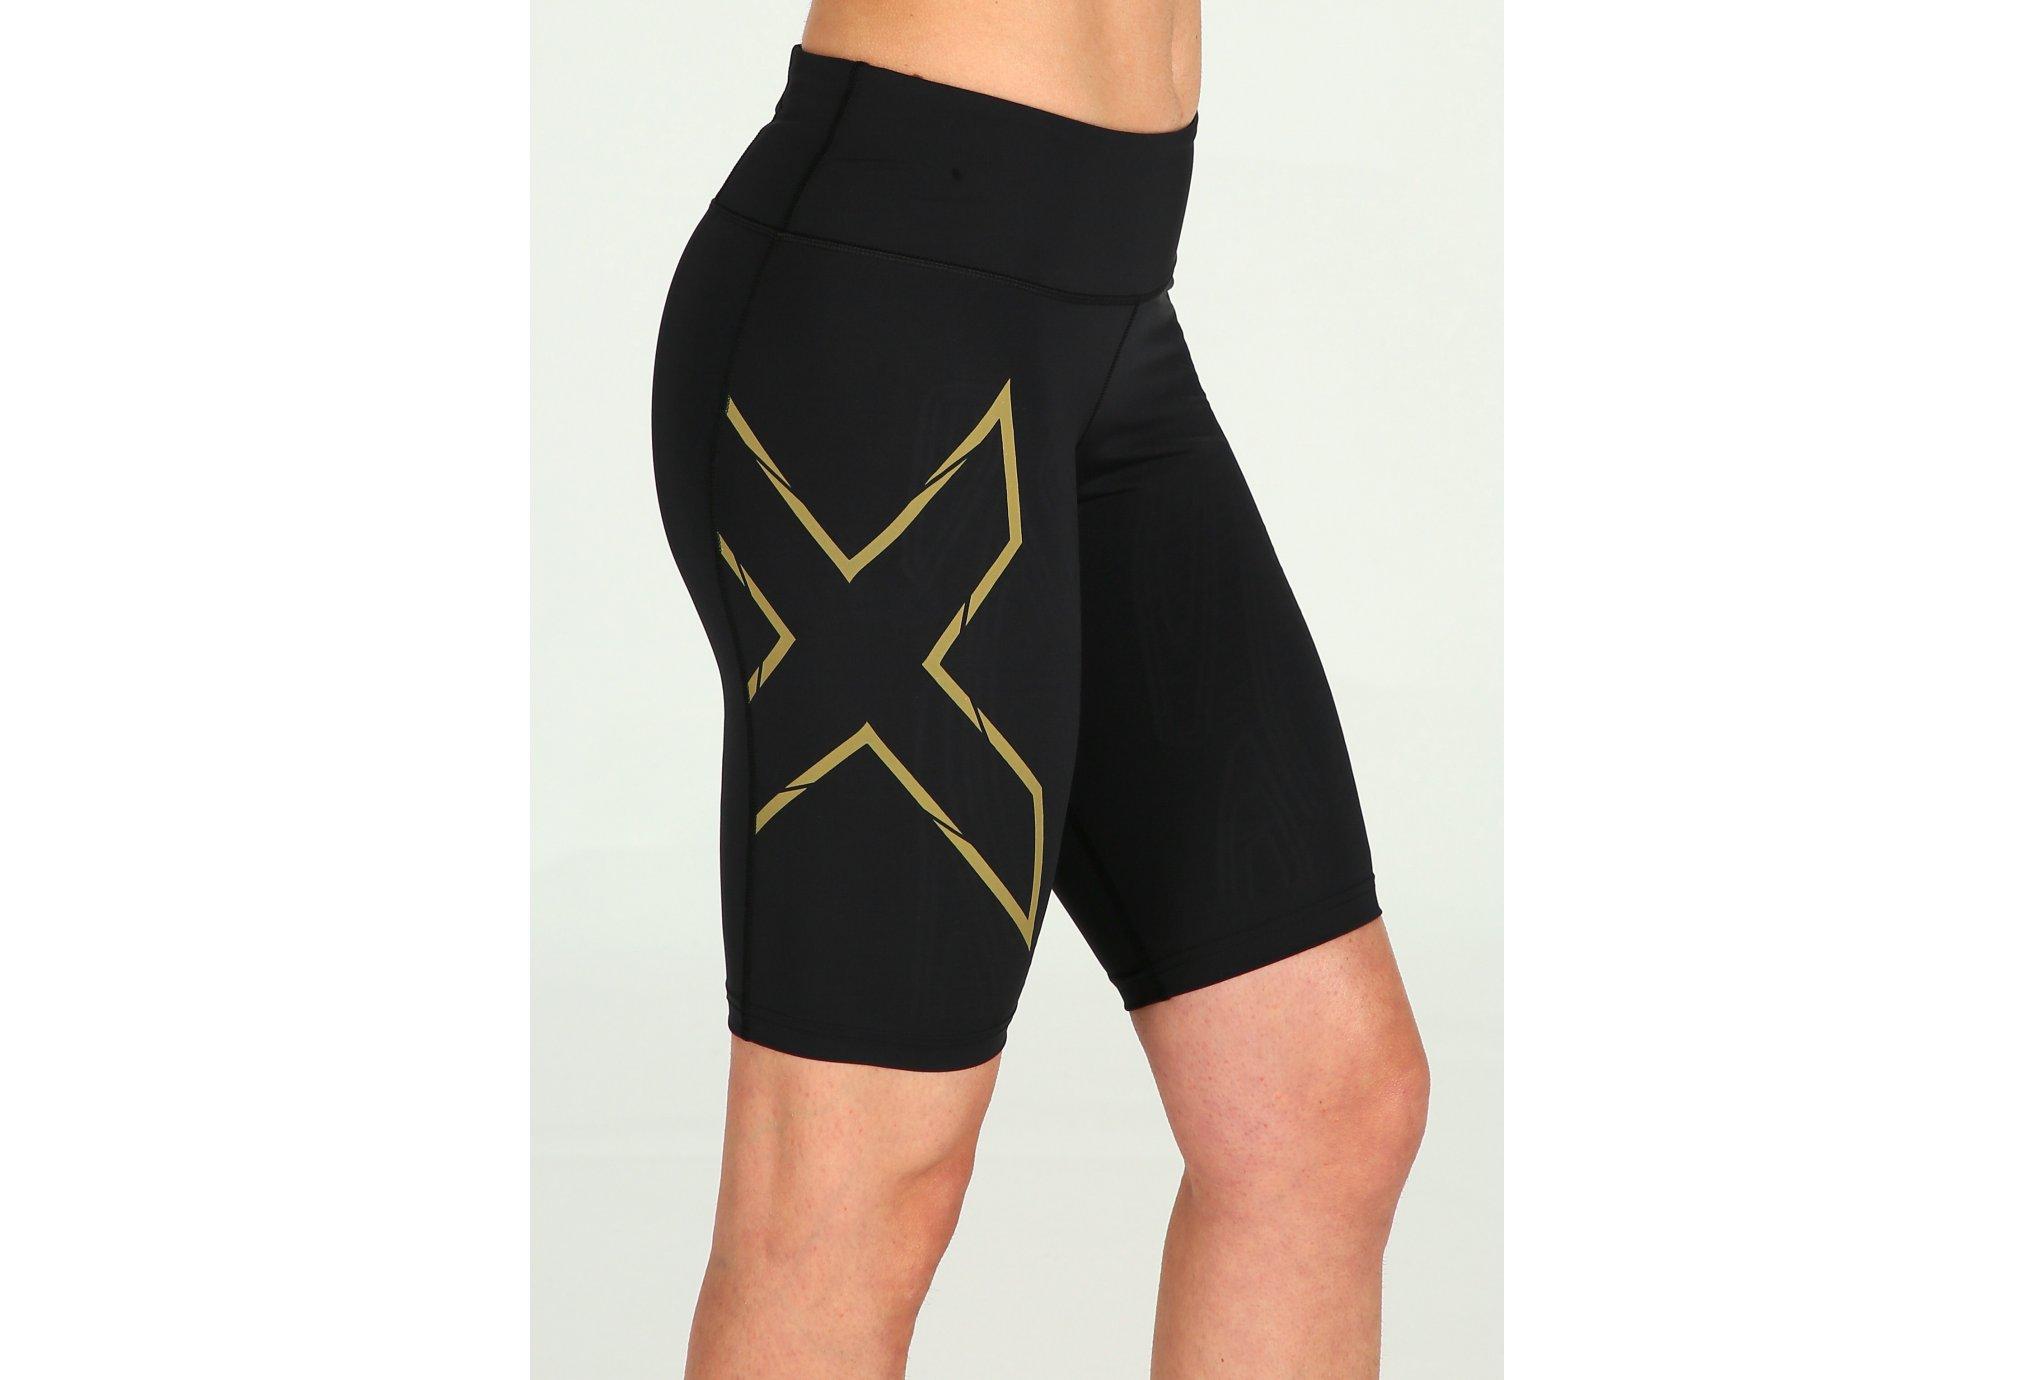 2xu Mcs compression w vêtement running femme